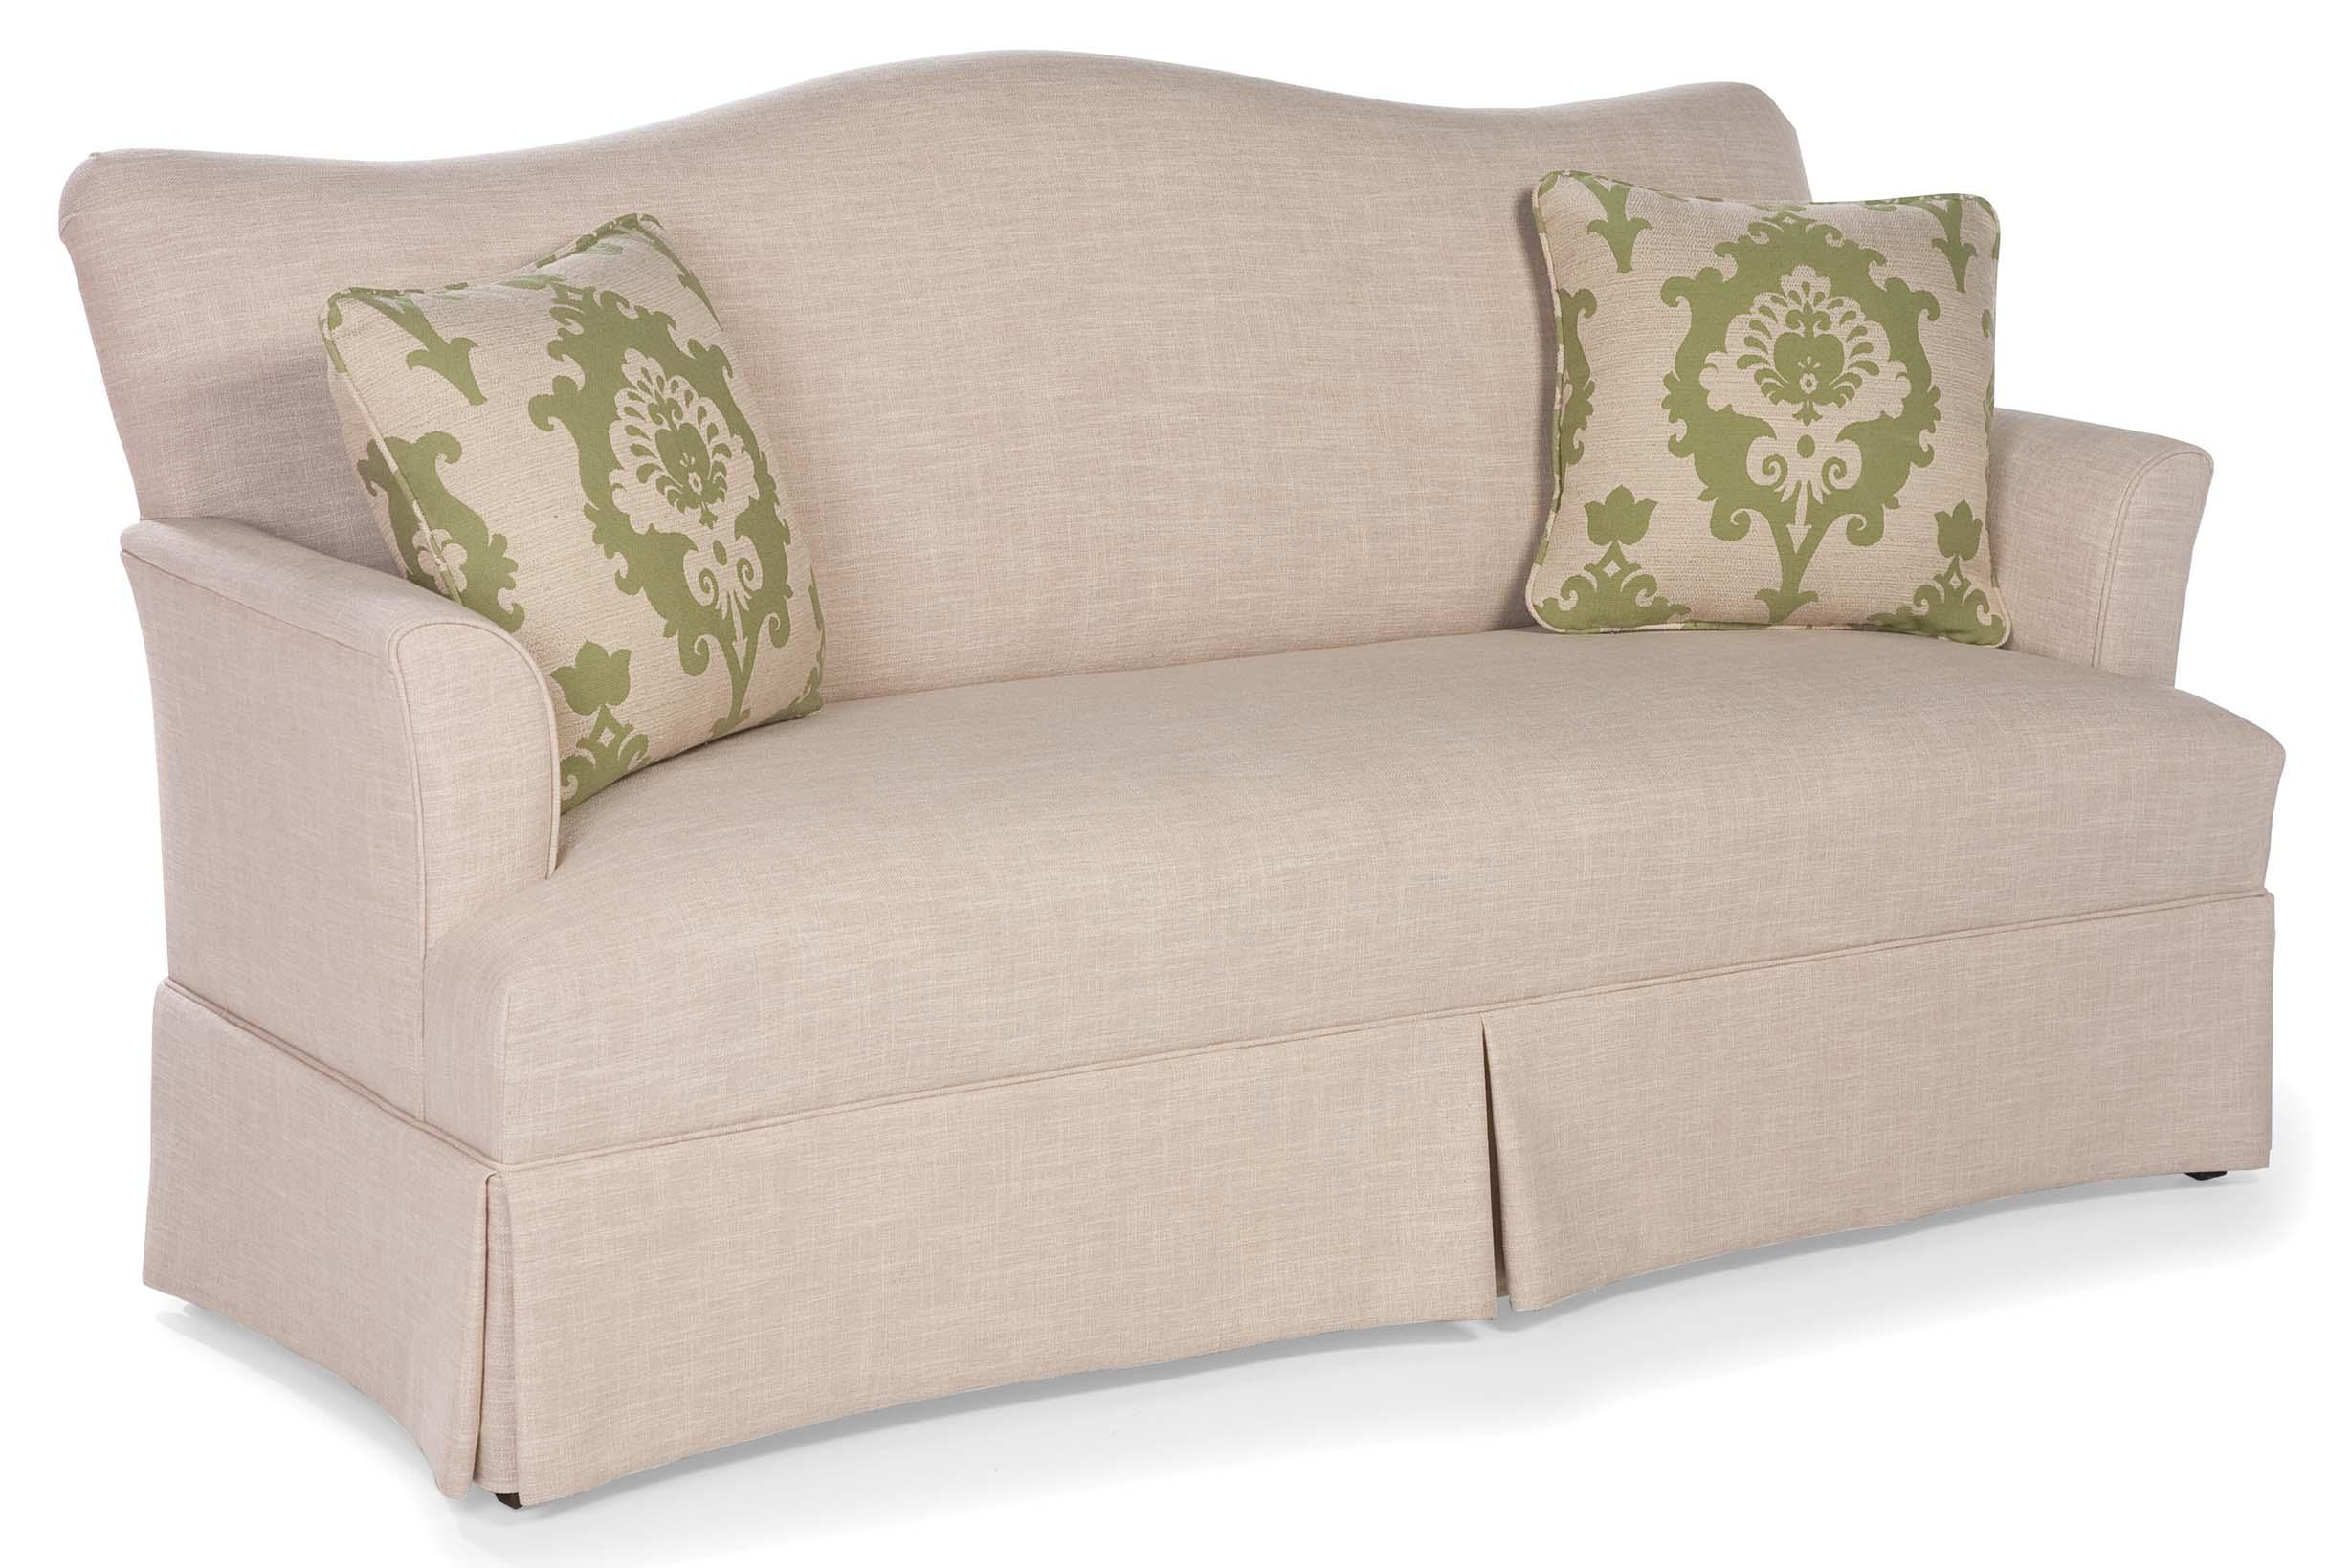 Fairfield Sofa Accents Skirted Sofa   Item Number: 2770 50